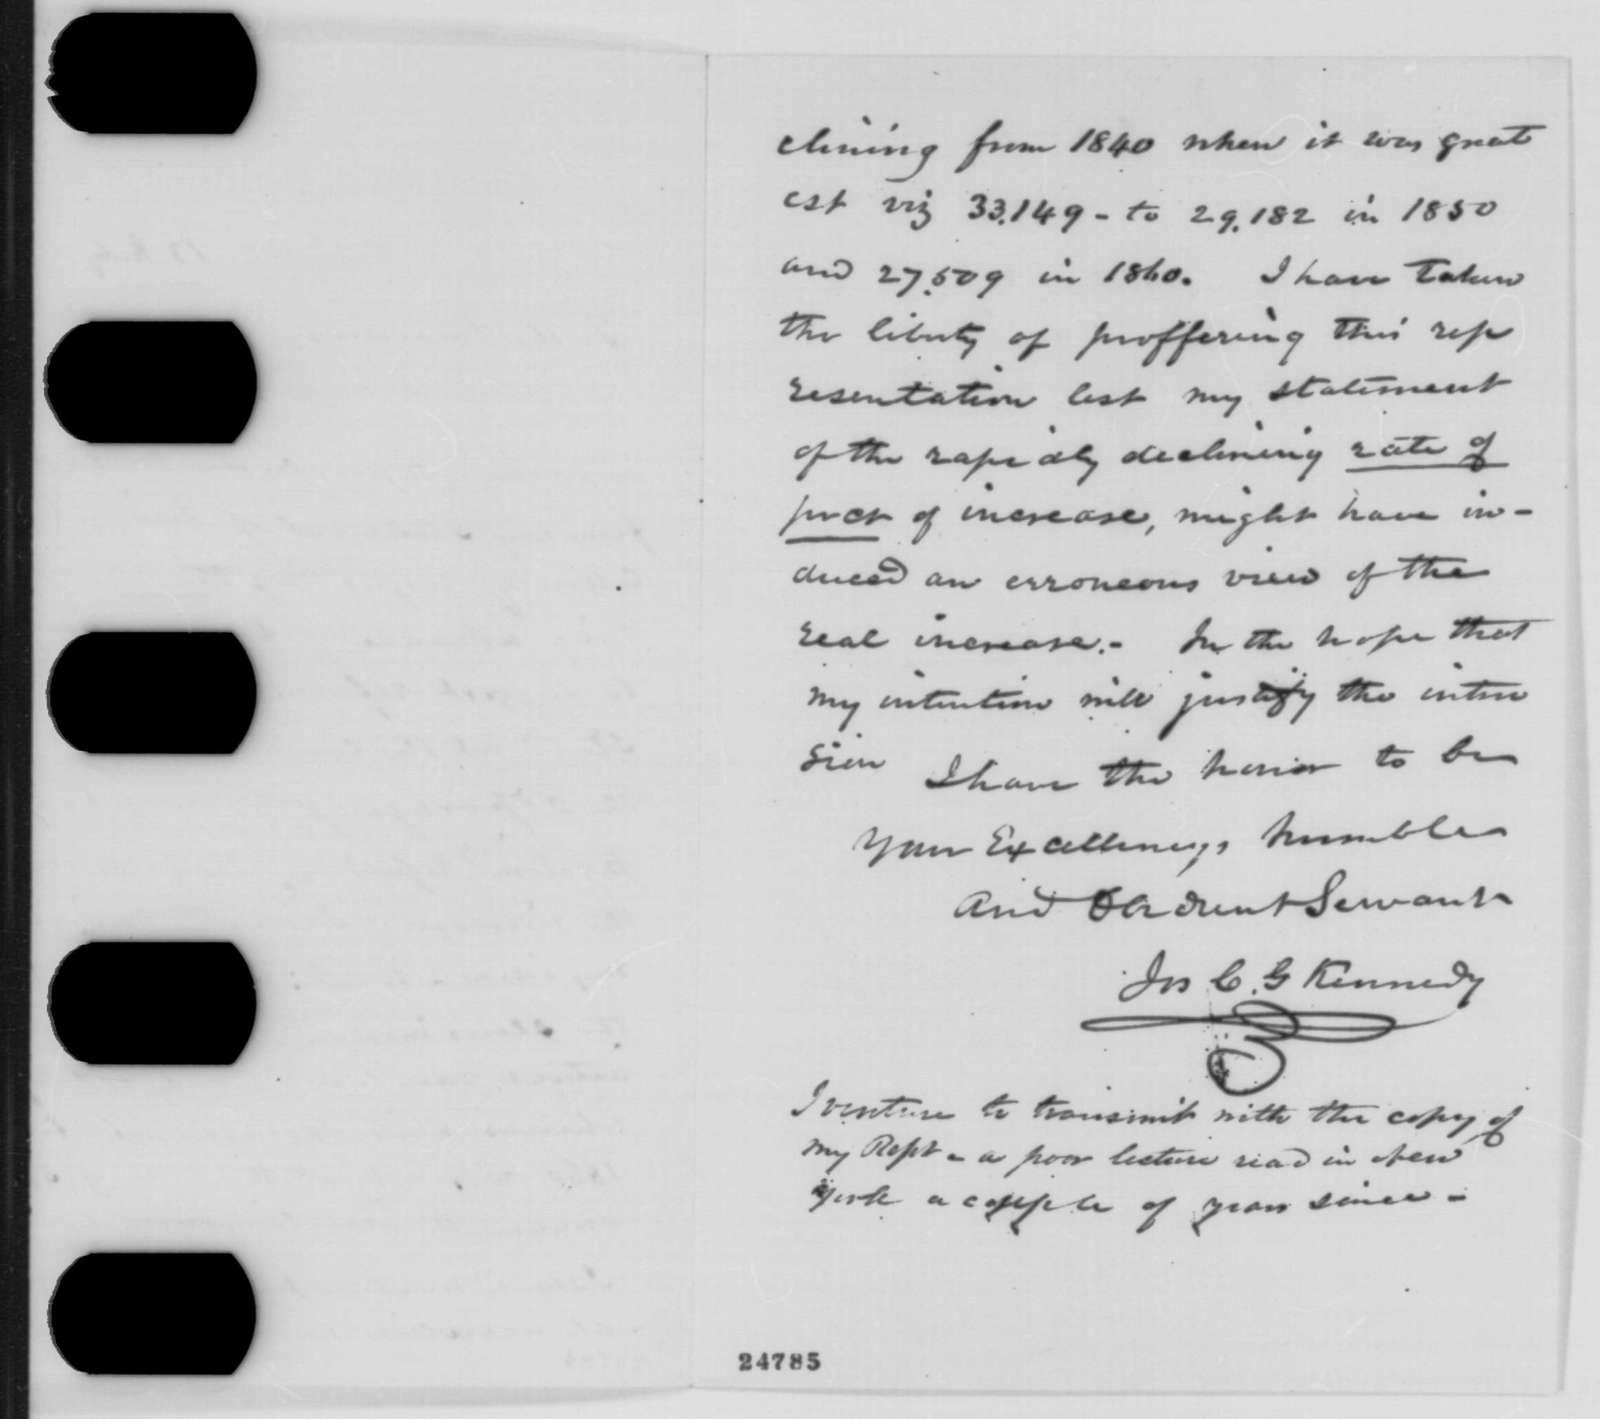 Joseph C. G. Kennedy to Abraham Lincoln, Monday, July 13, 1863  (Slave population in Missouri)